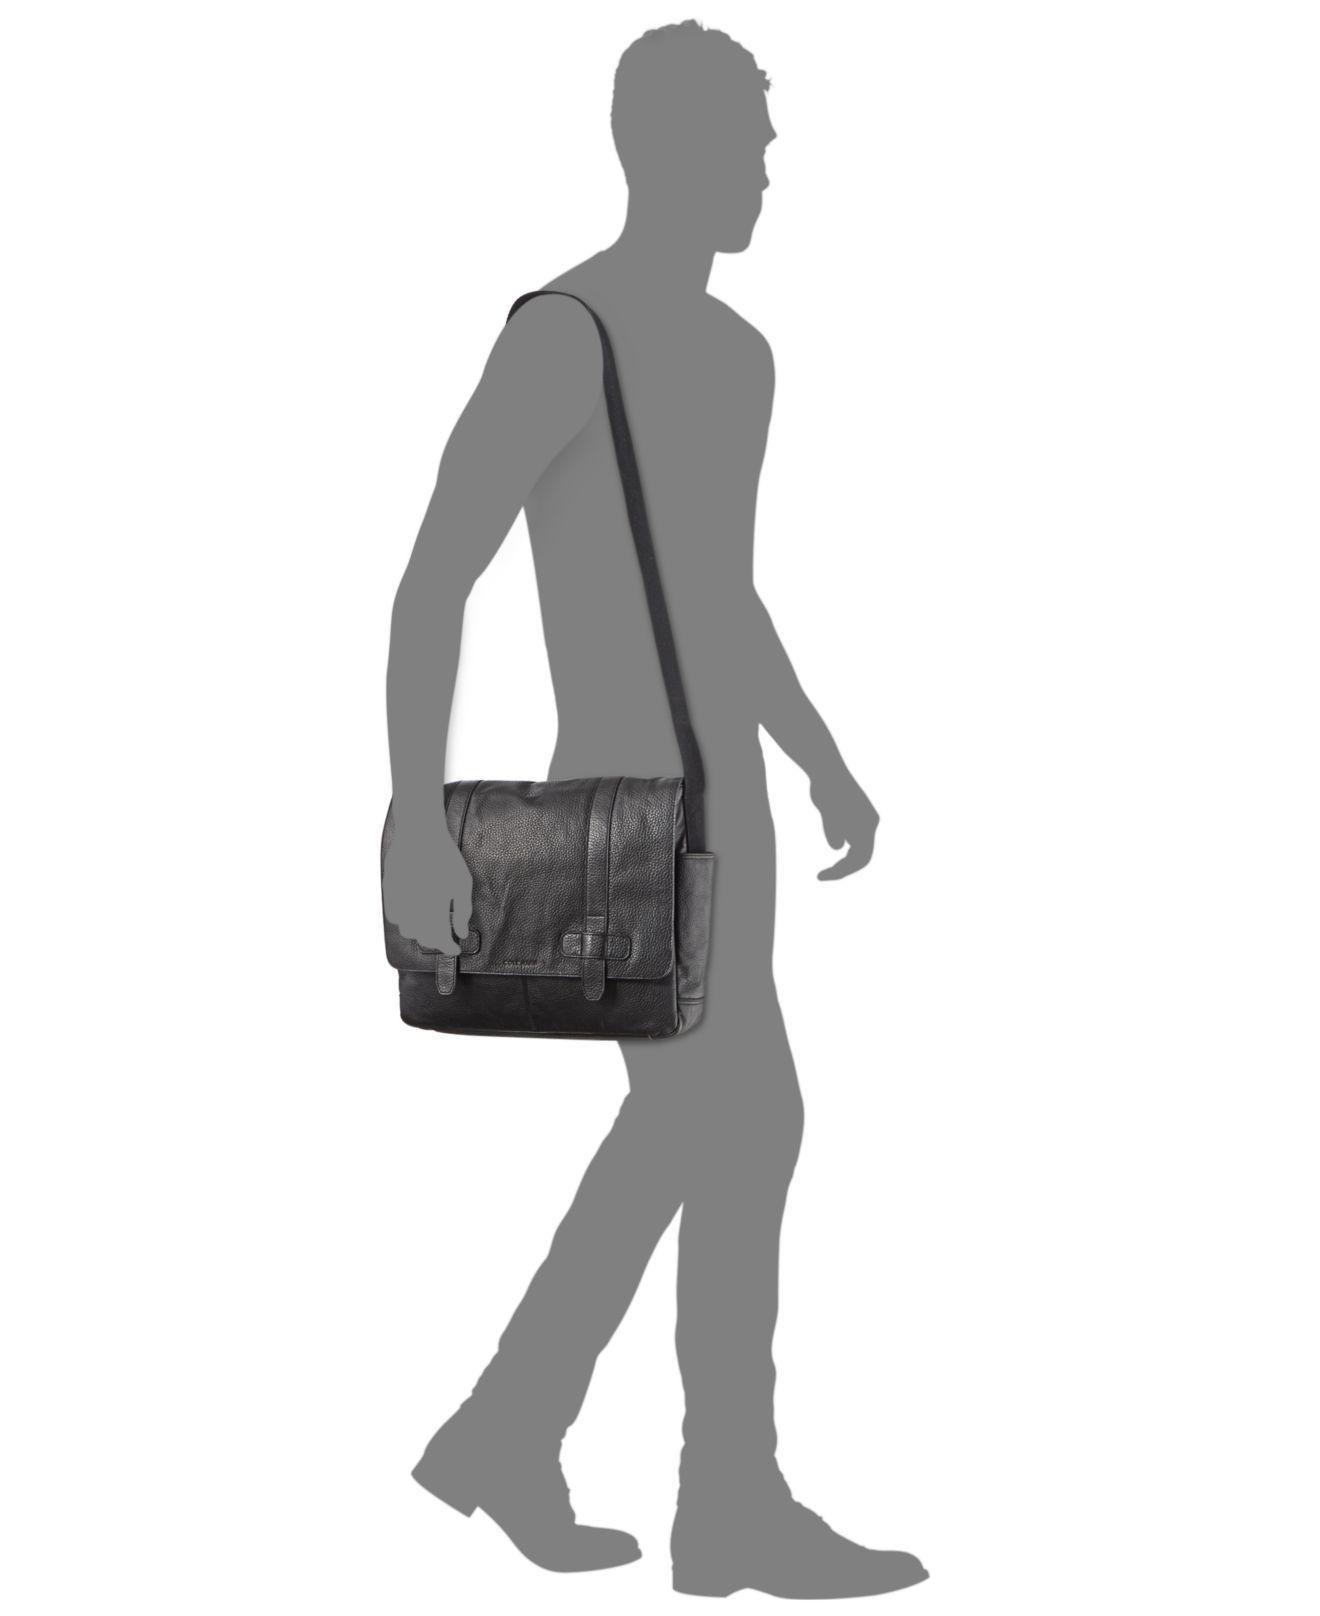 a5379e5f0d92 Lyst - Cole Haan Men s Barrington Messenger Bag in Black for Men